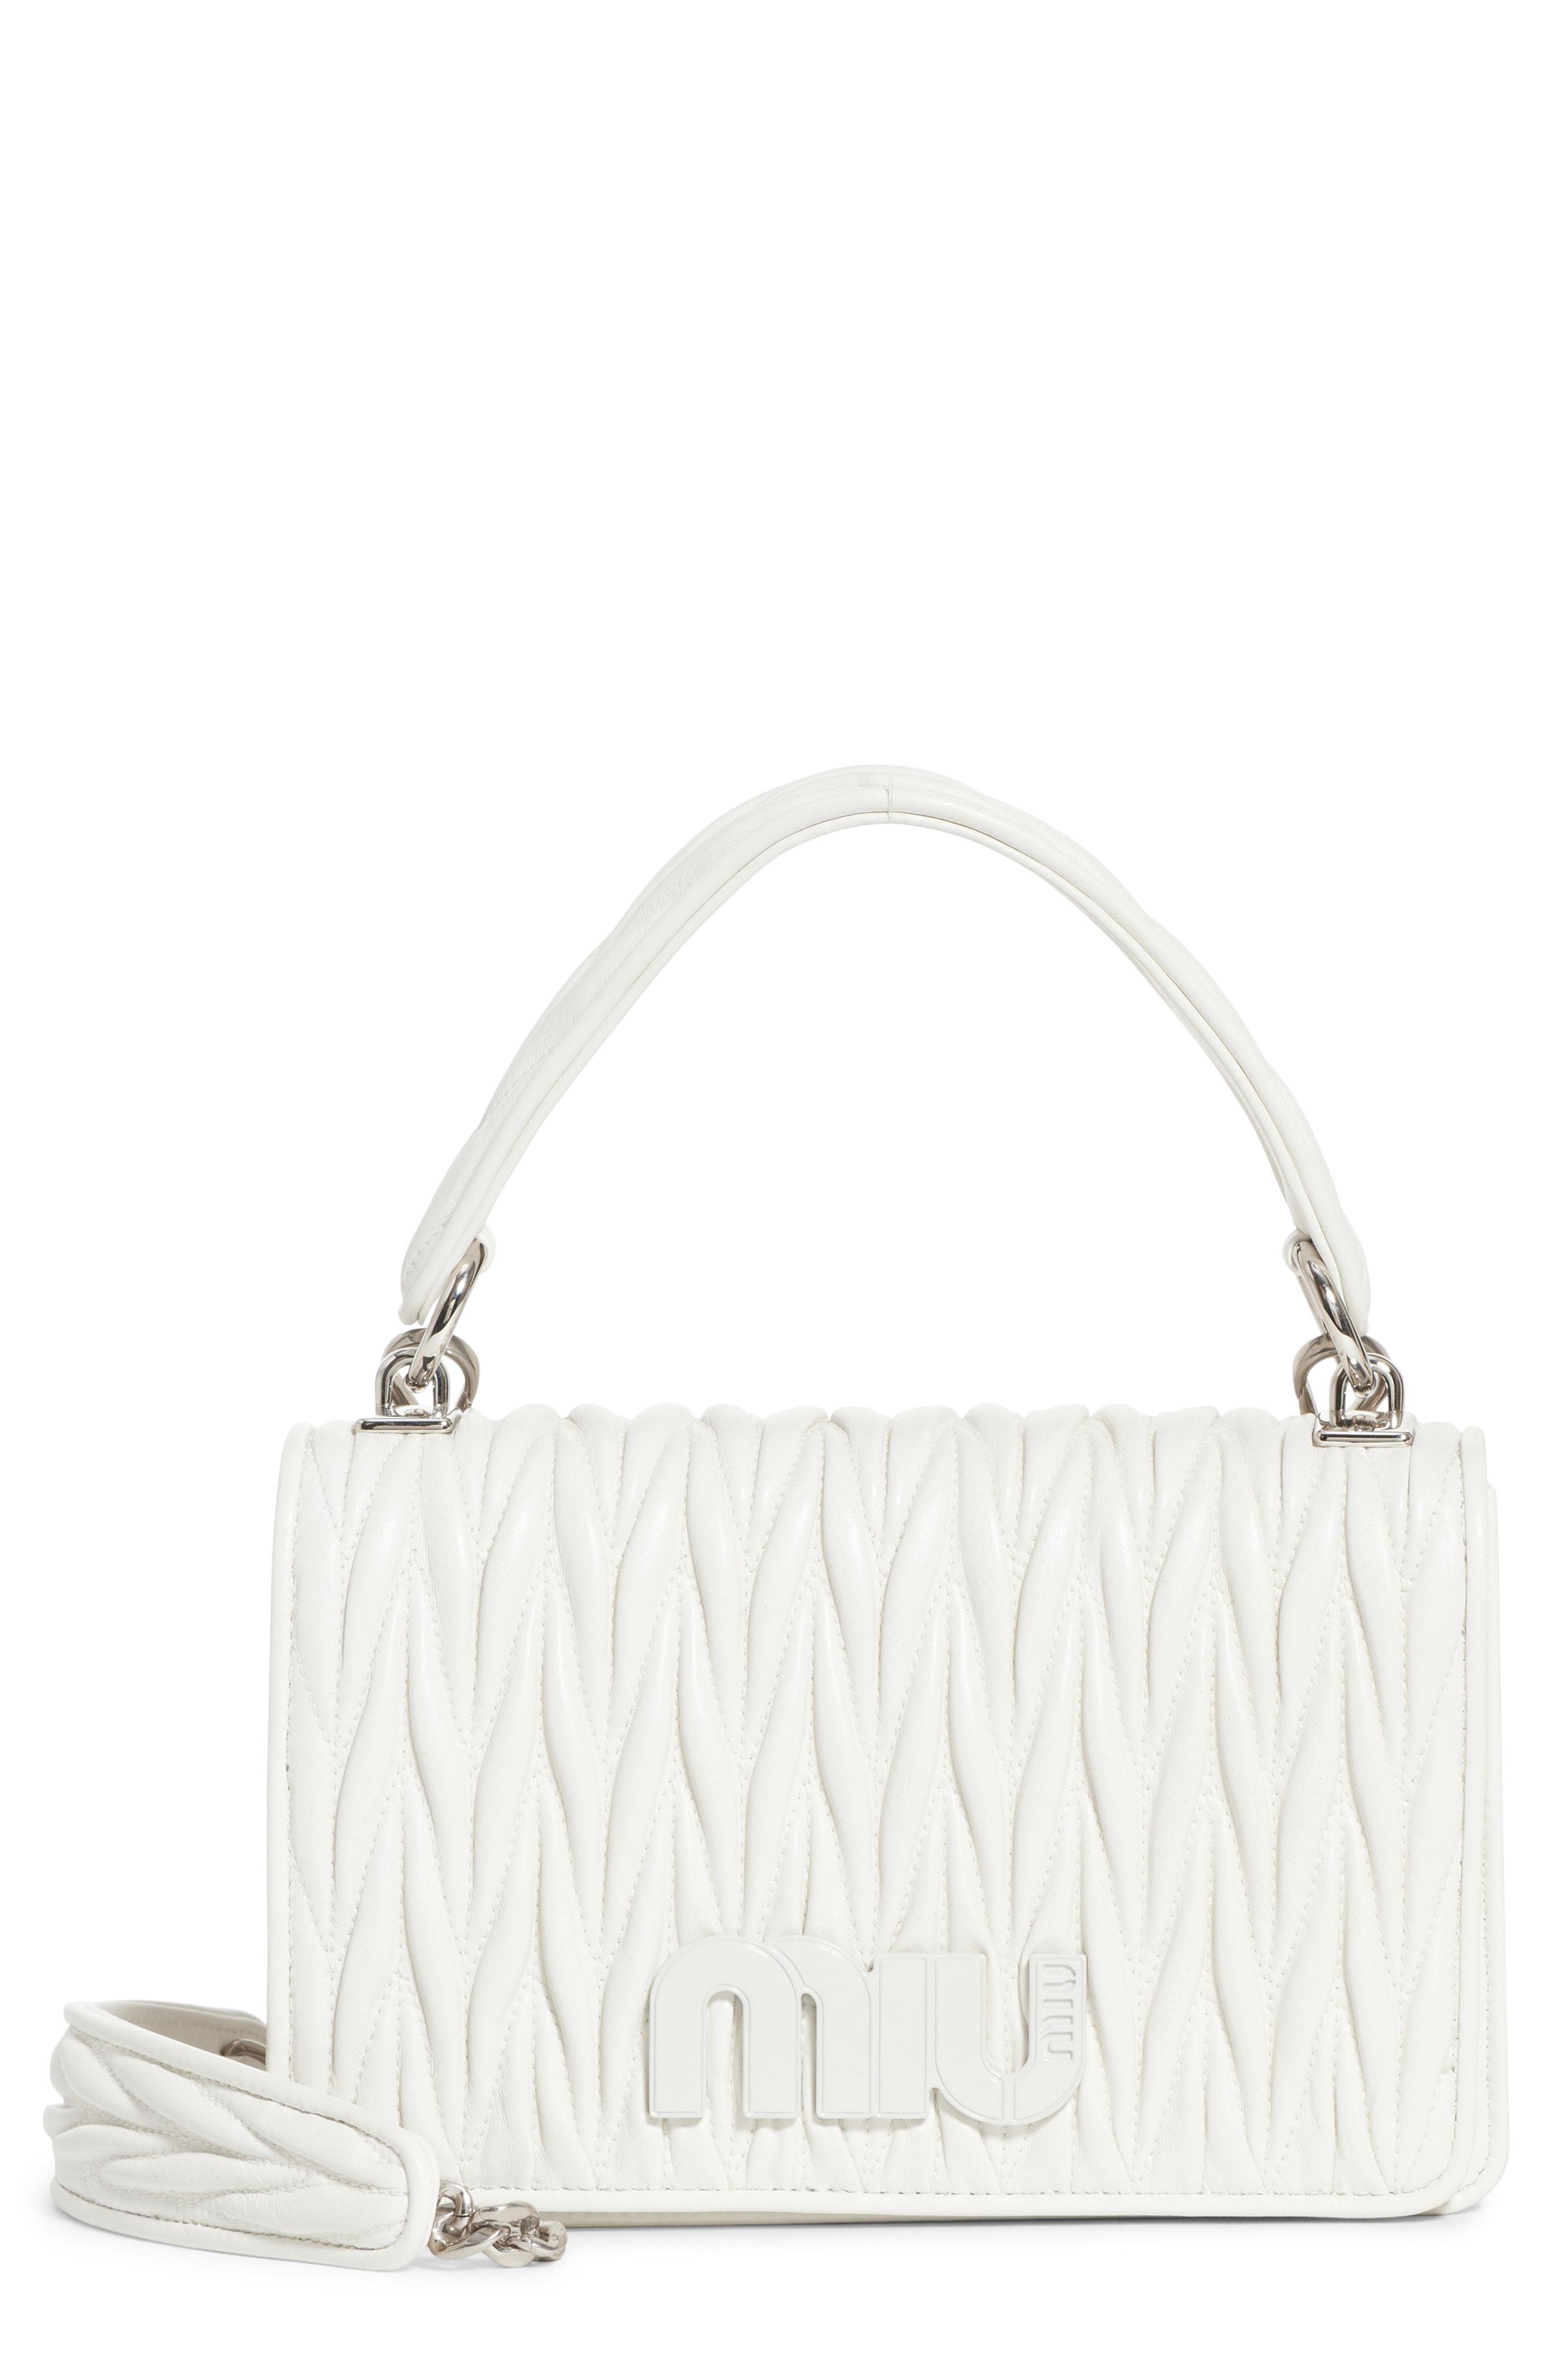 Lyst - Miu Miu Matelasse Quilted Lambskin Leather Top Handle Bag in ... 4b8a3cc870b34